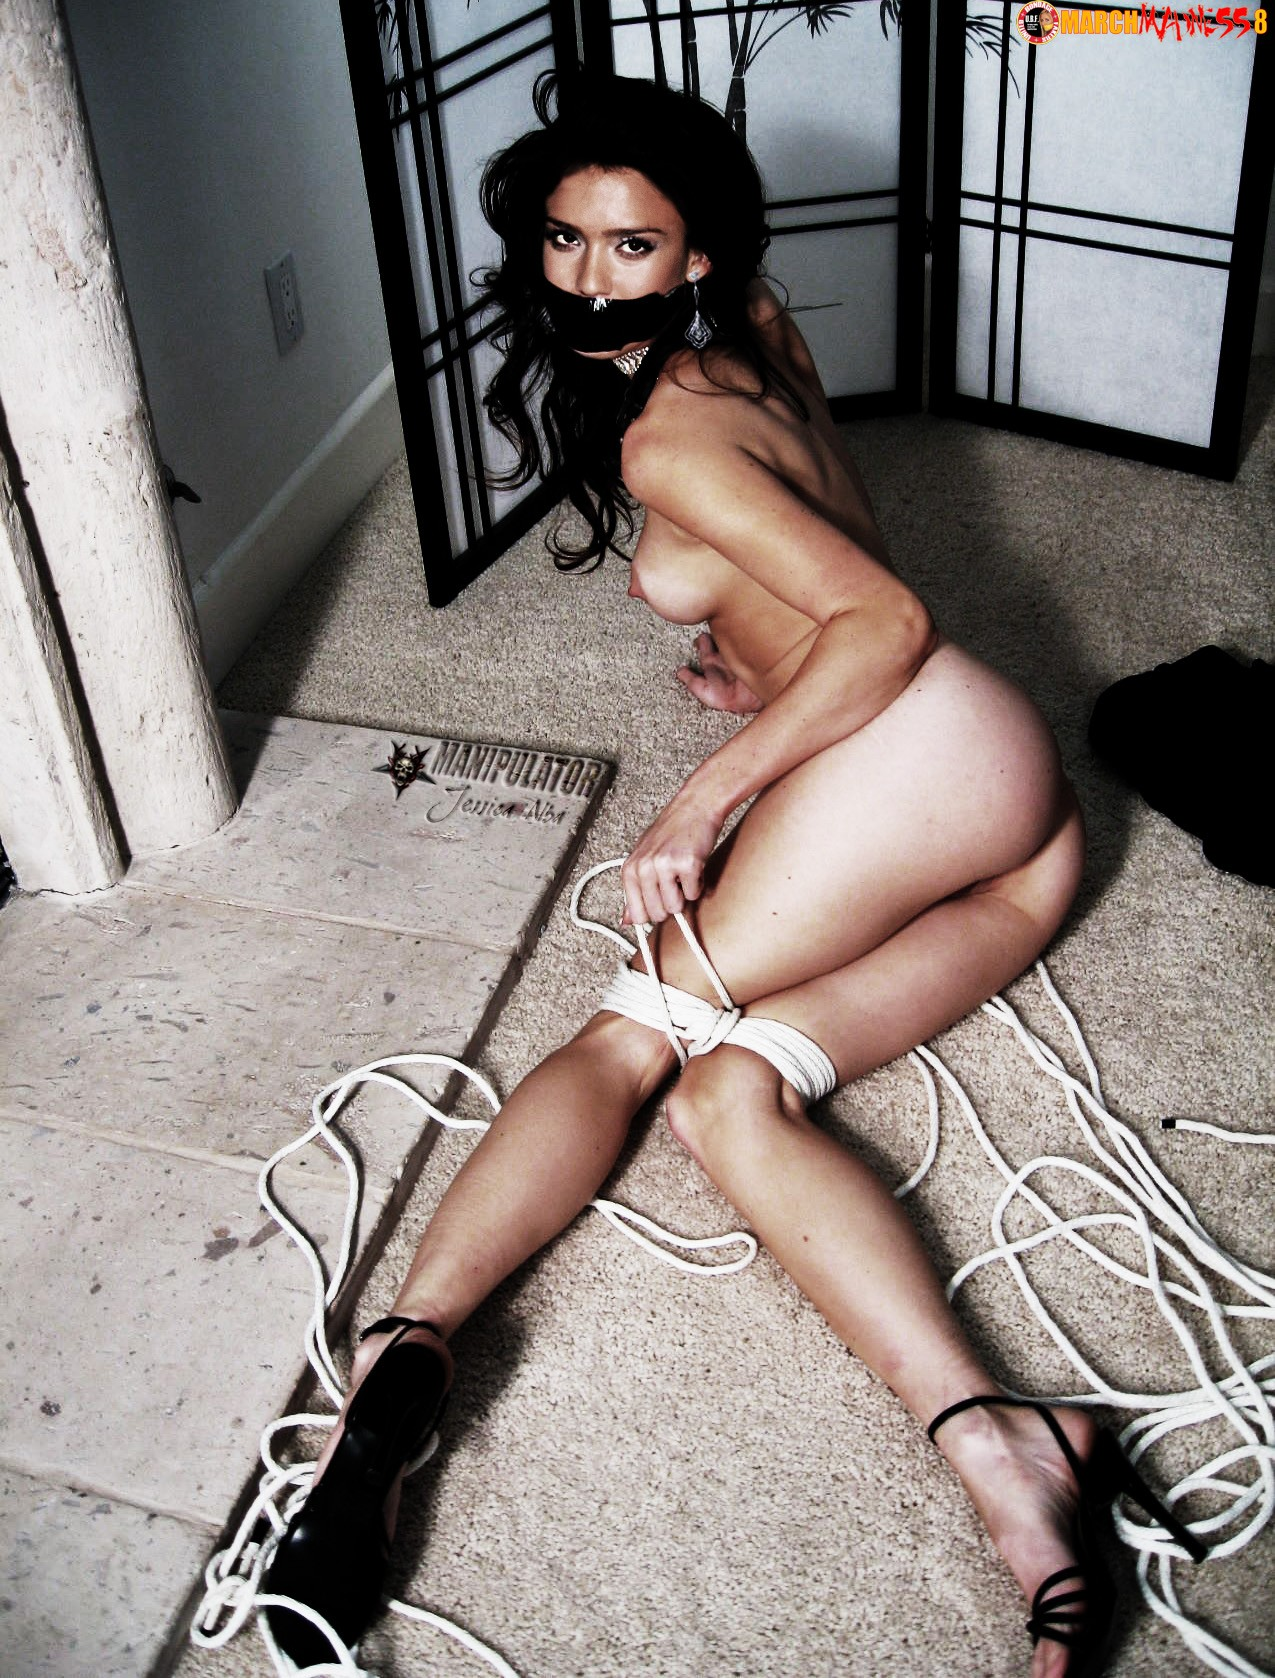 jessica-alba-fakes-bondage-porn-moving